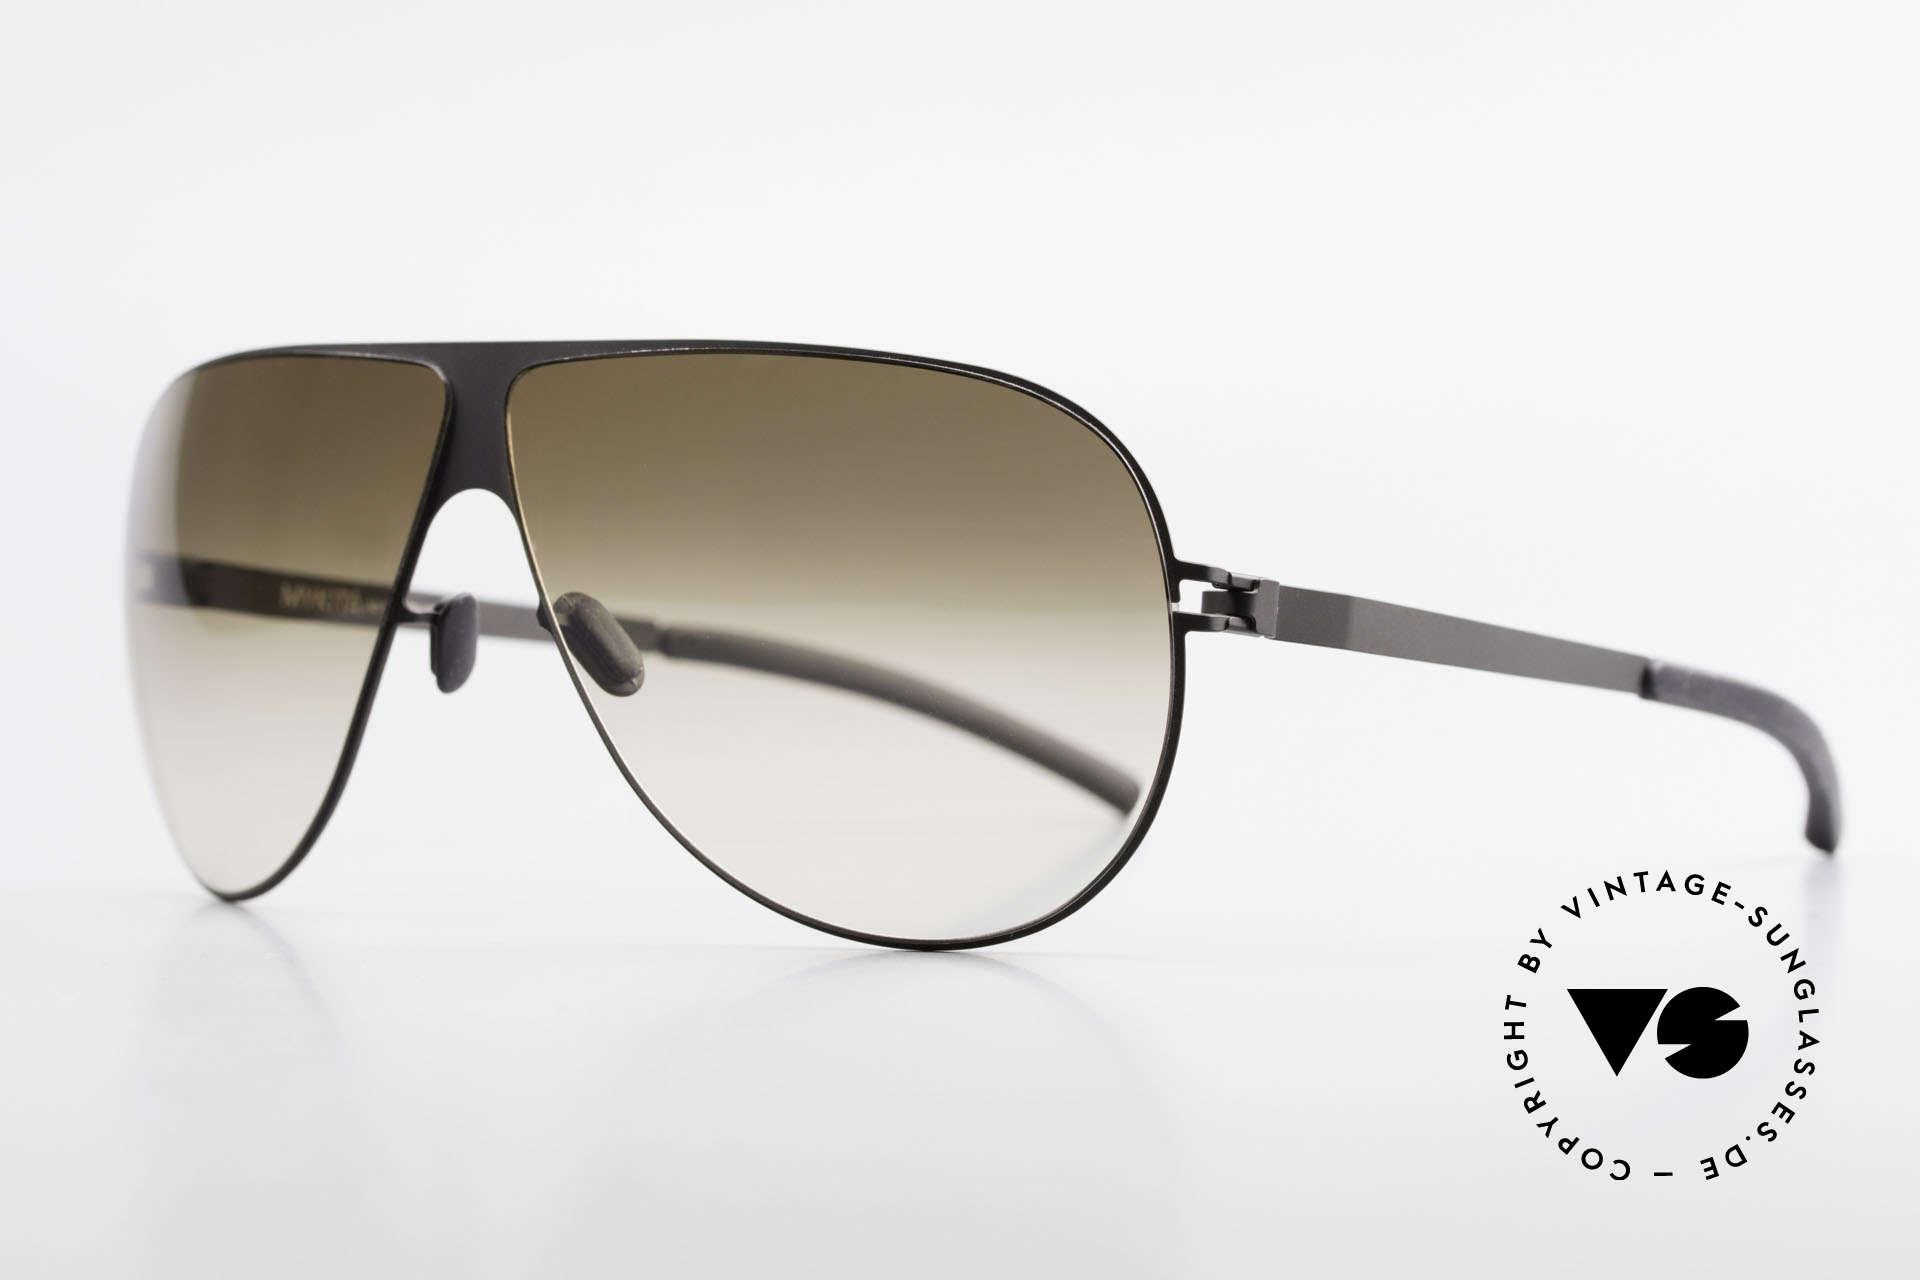 Mykita Elliot Mykita Tom Cruise Sonnenbrille, Mod. No.1 Sun Elliot Black, brown-gradient flash, 68/07, Passend für Herren